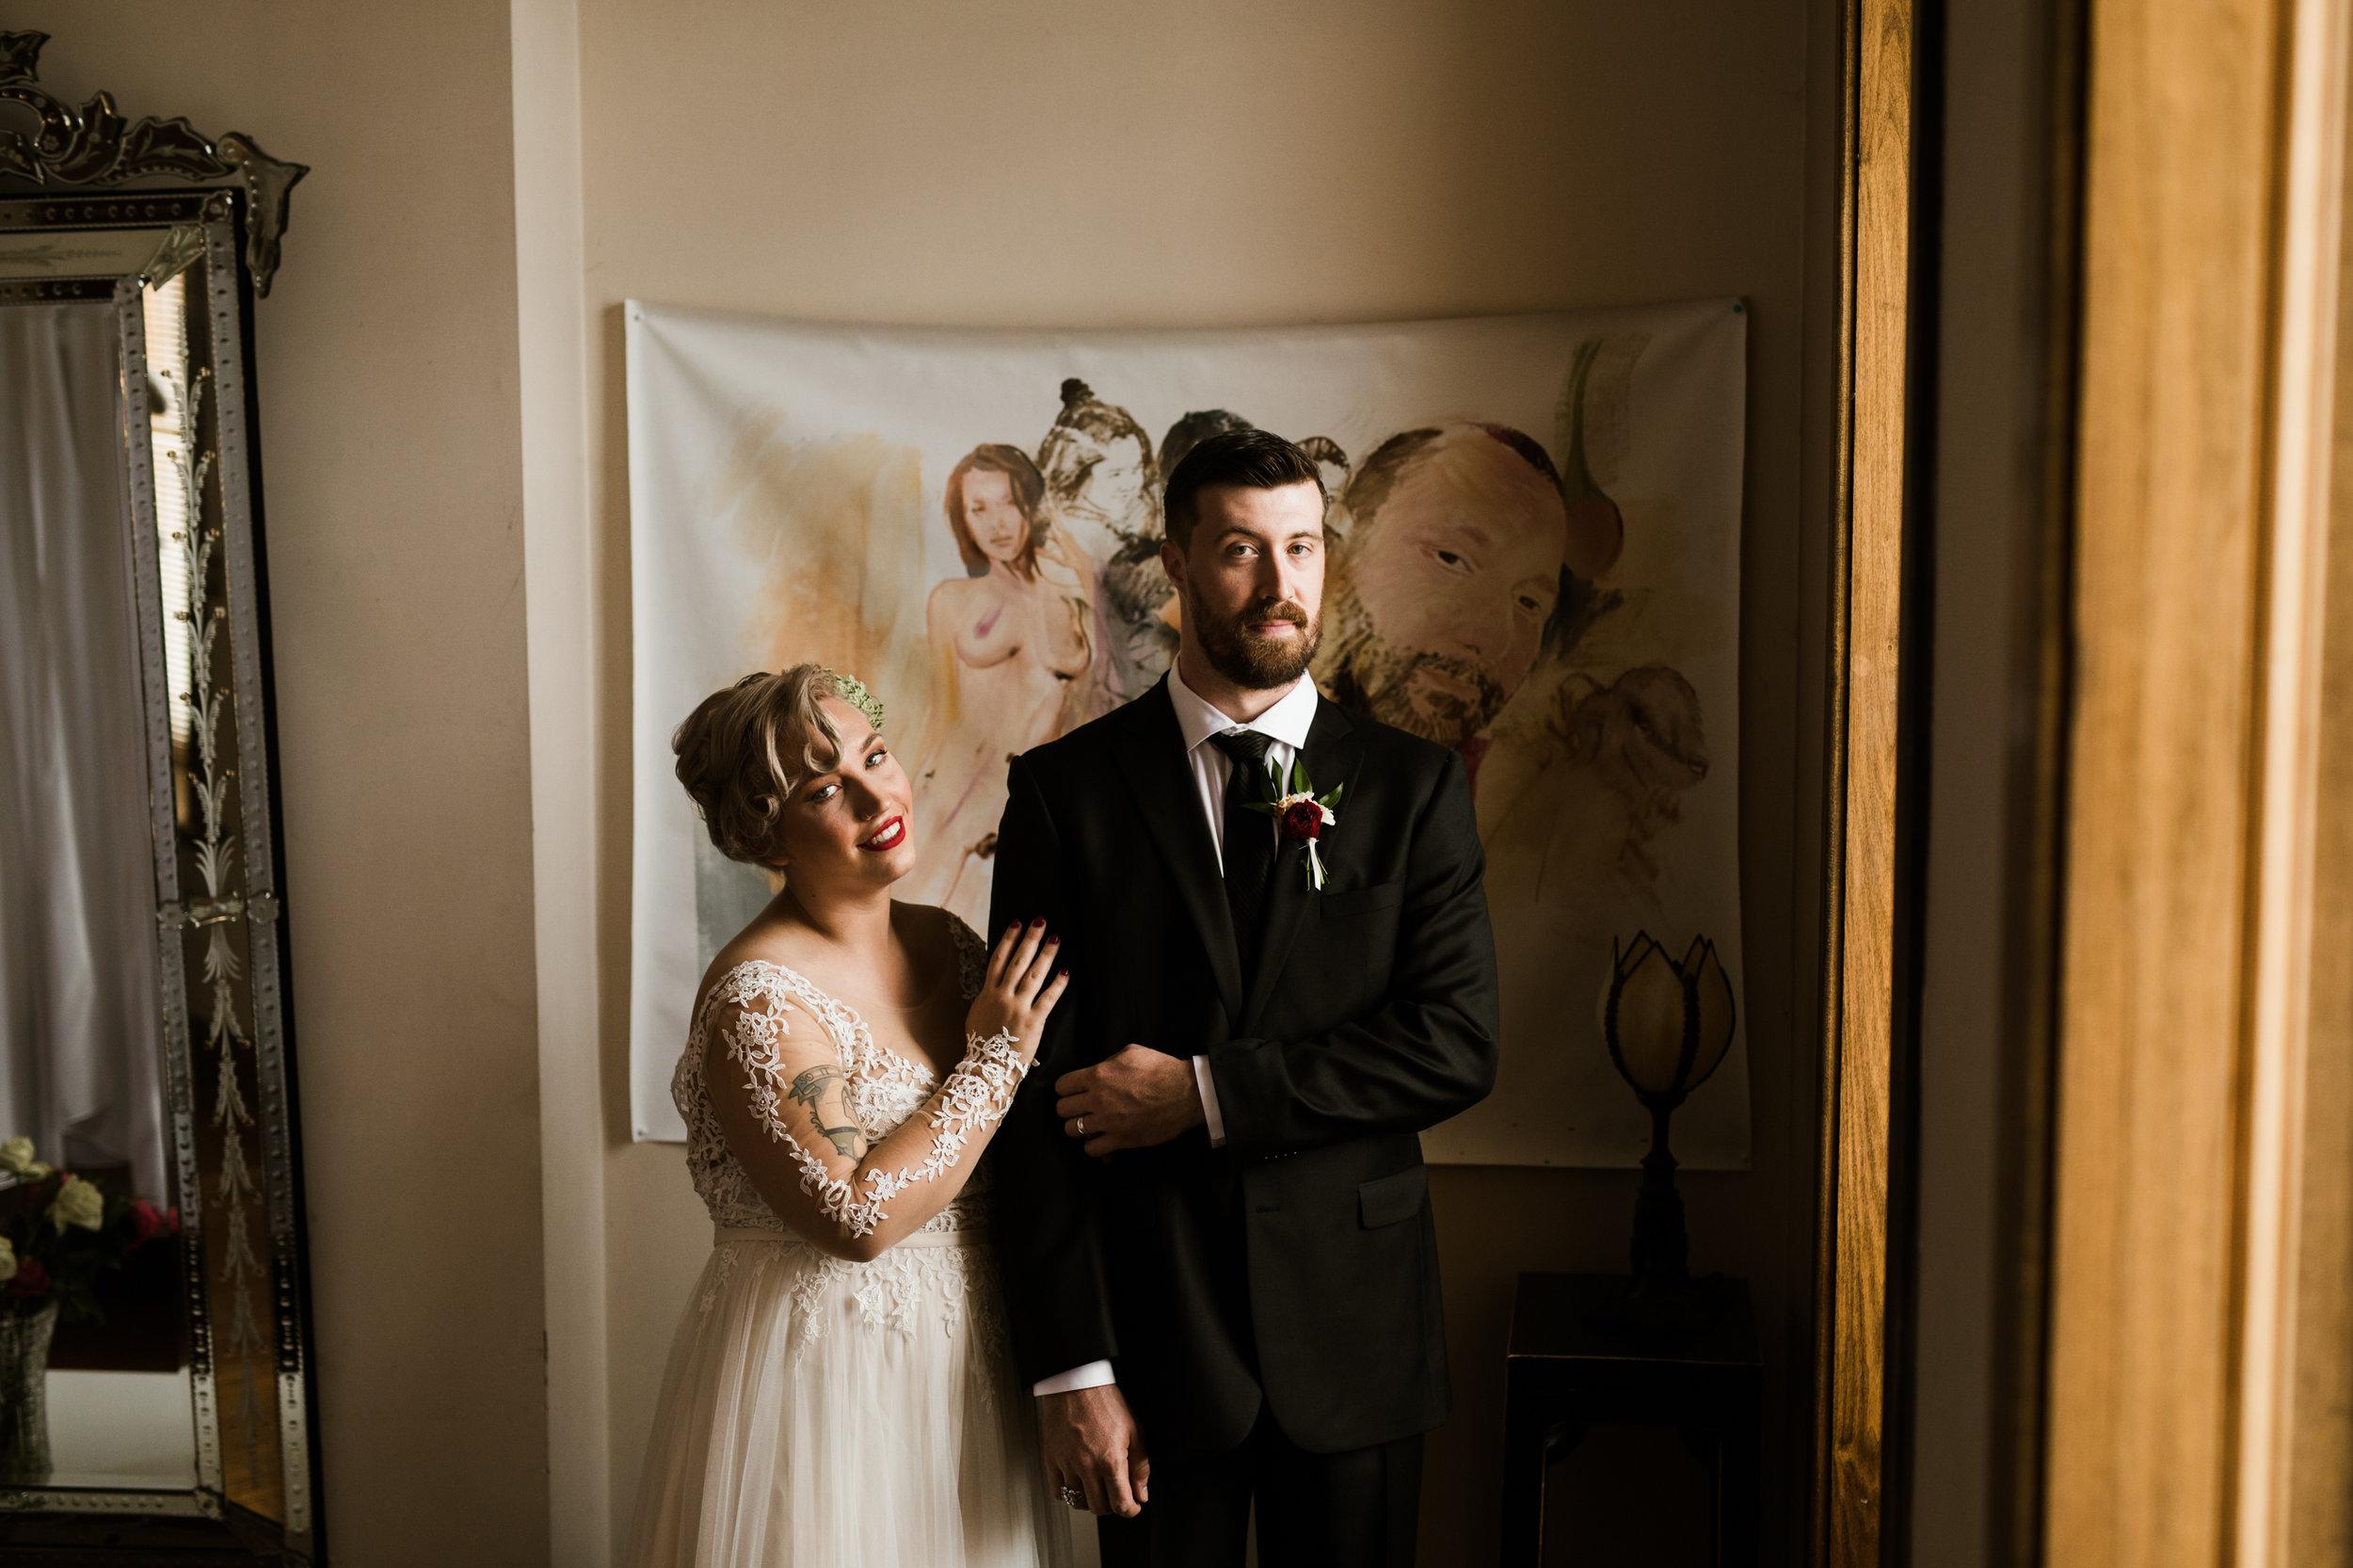 Kentucky Wedding Louisville Wedding Photographer 2018 Crystal Ludwick Photo Louisville Wedding Photographer Kentucky Wedding Photographer (86 of 105).jpg